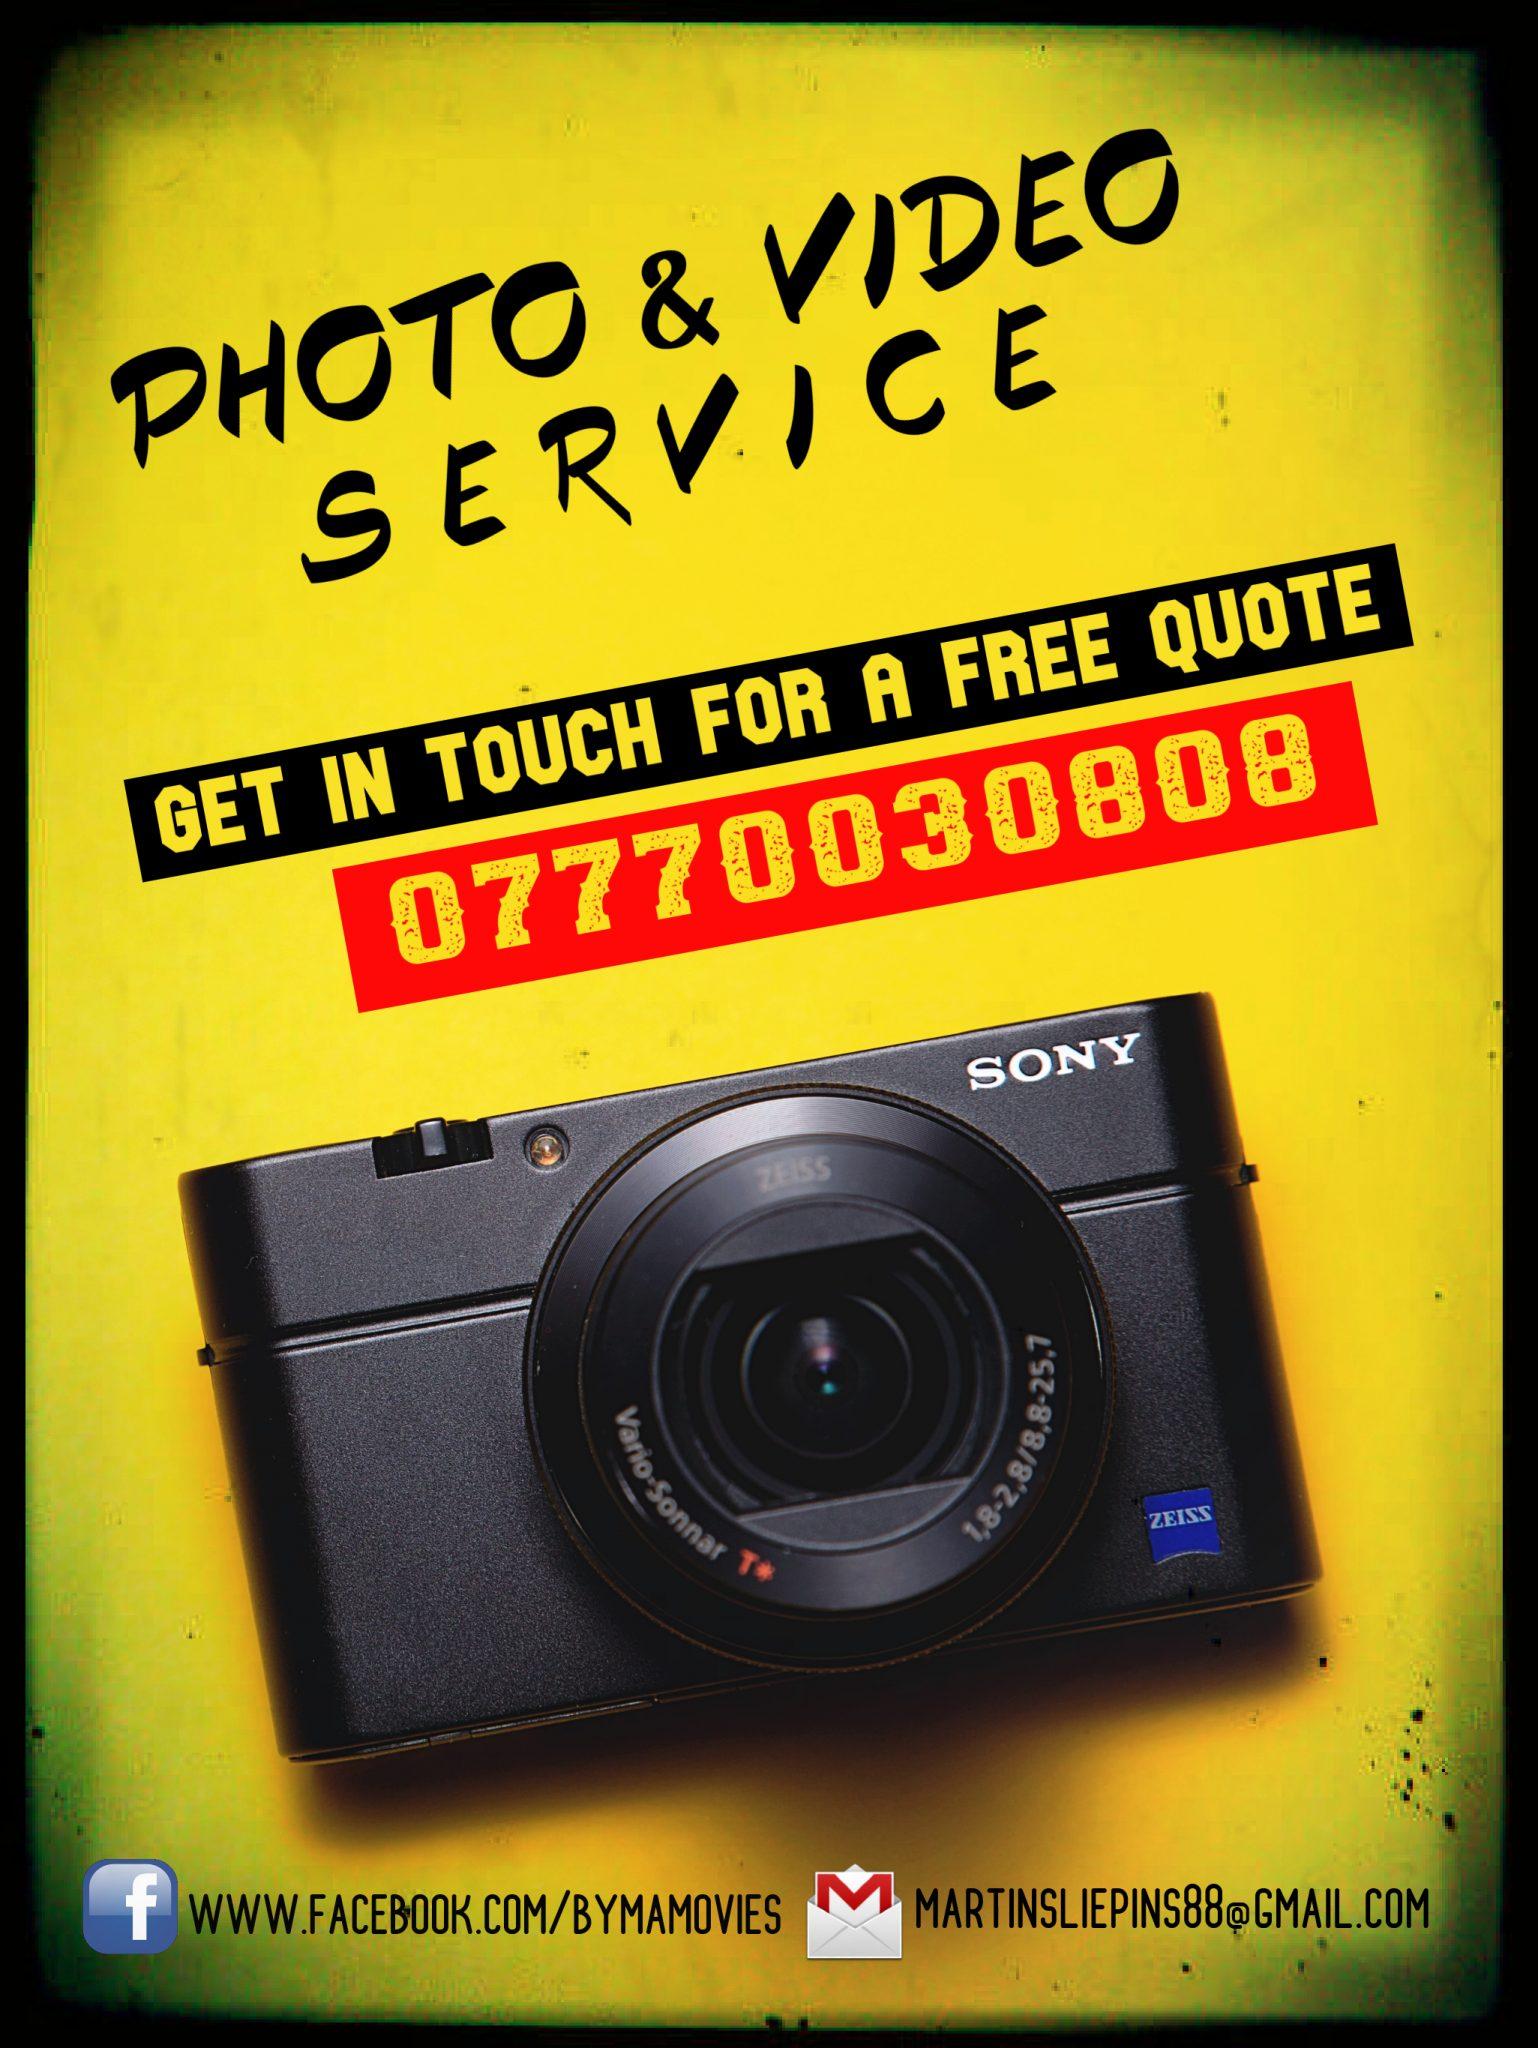 Photo & Video Service